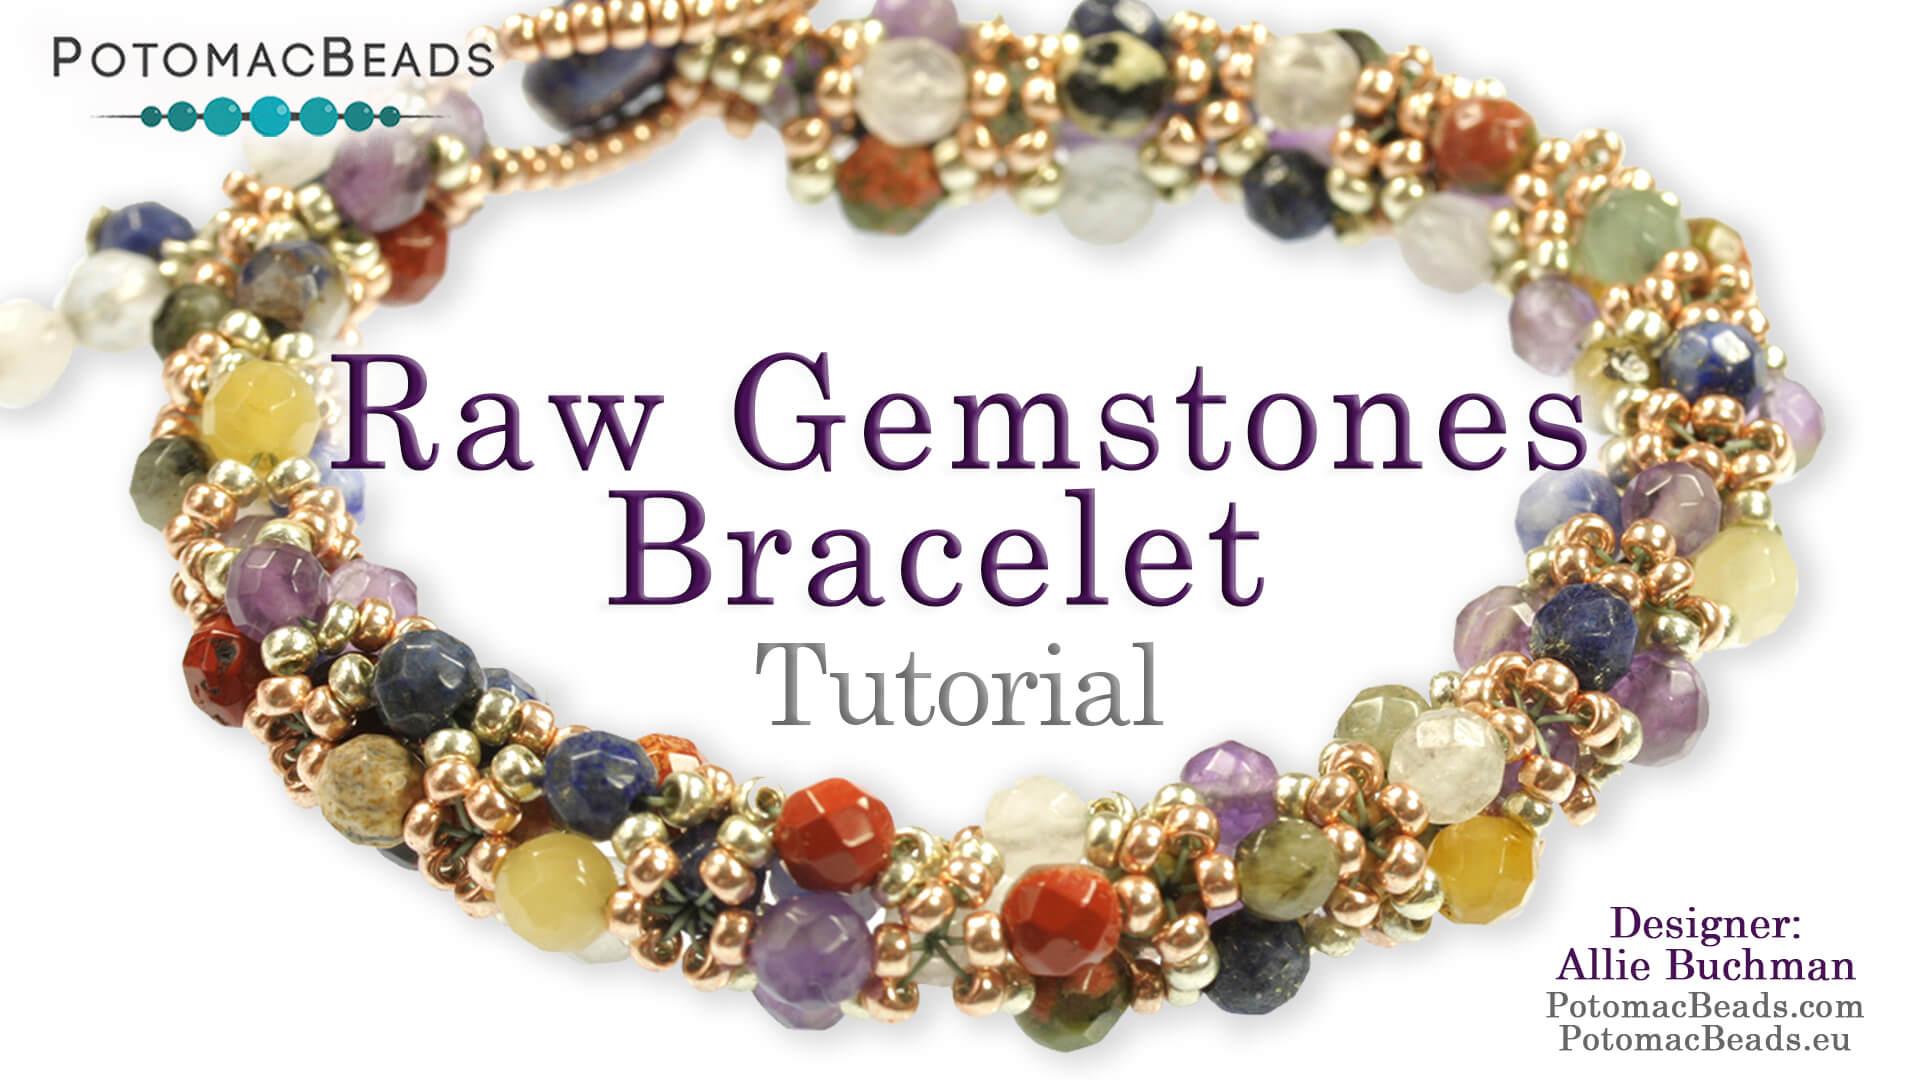 How to Bead / Free Video Tutorials / Bracelet Projects / RAW Gemstone Bracelet Tutorial